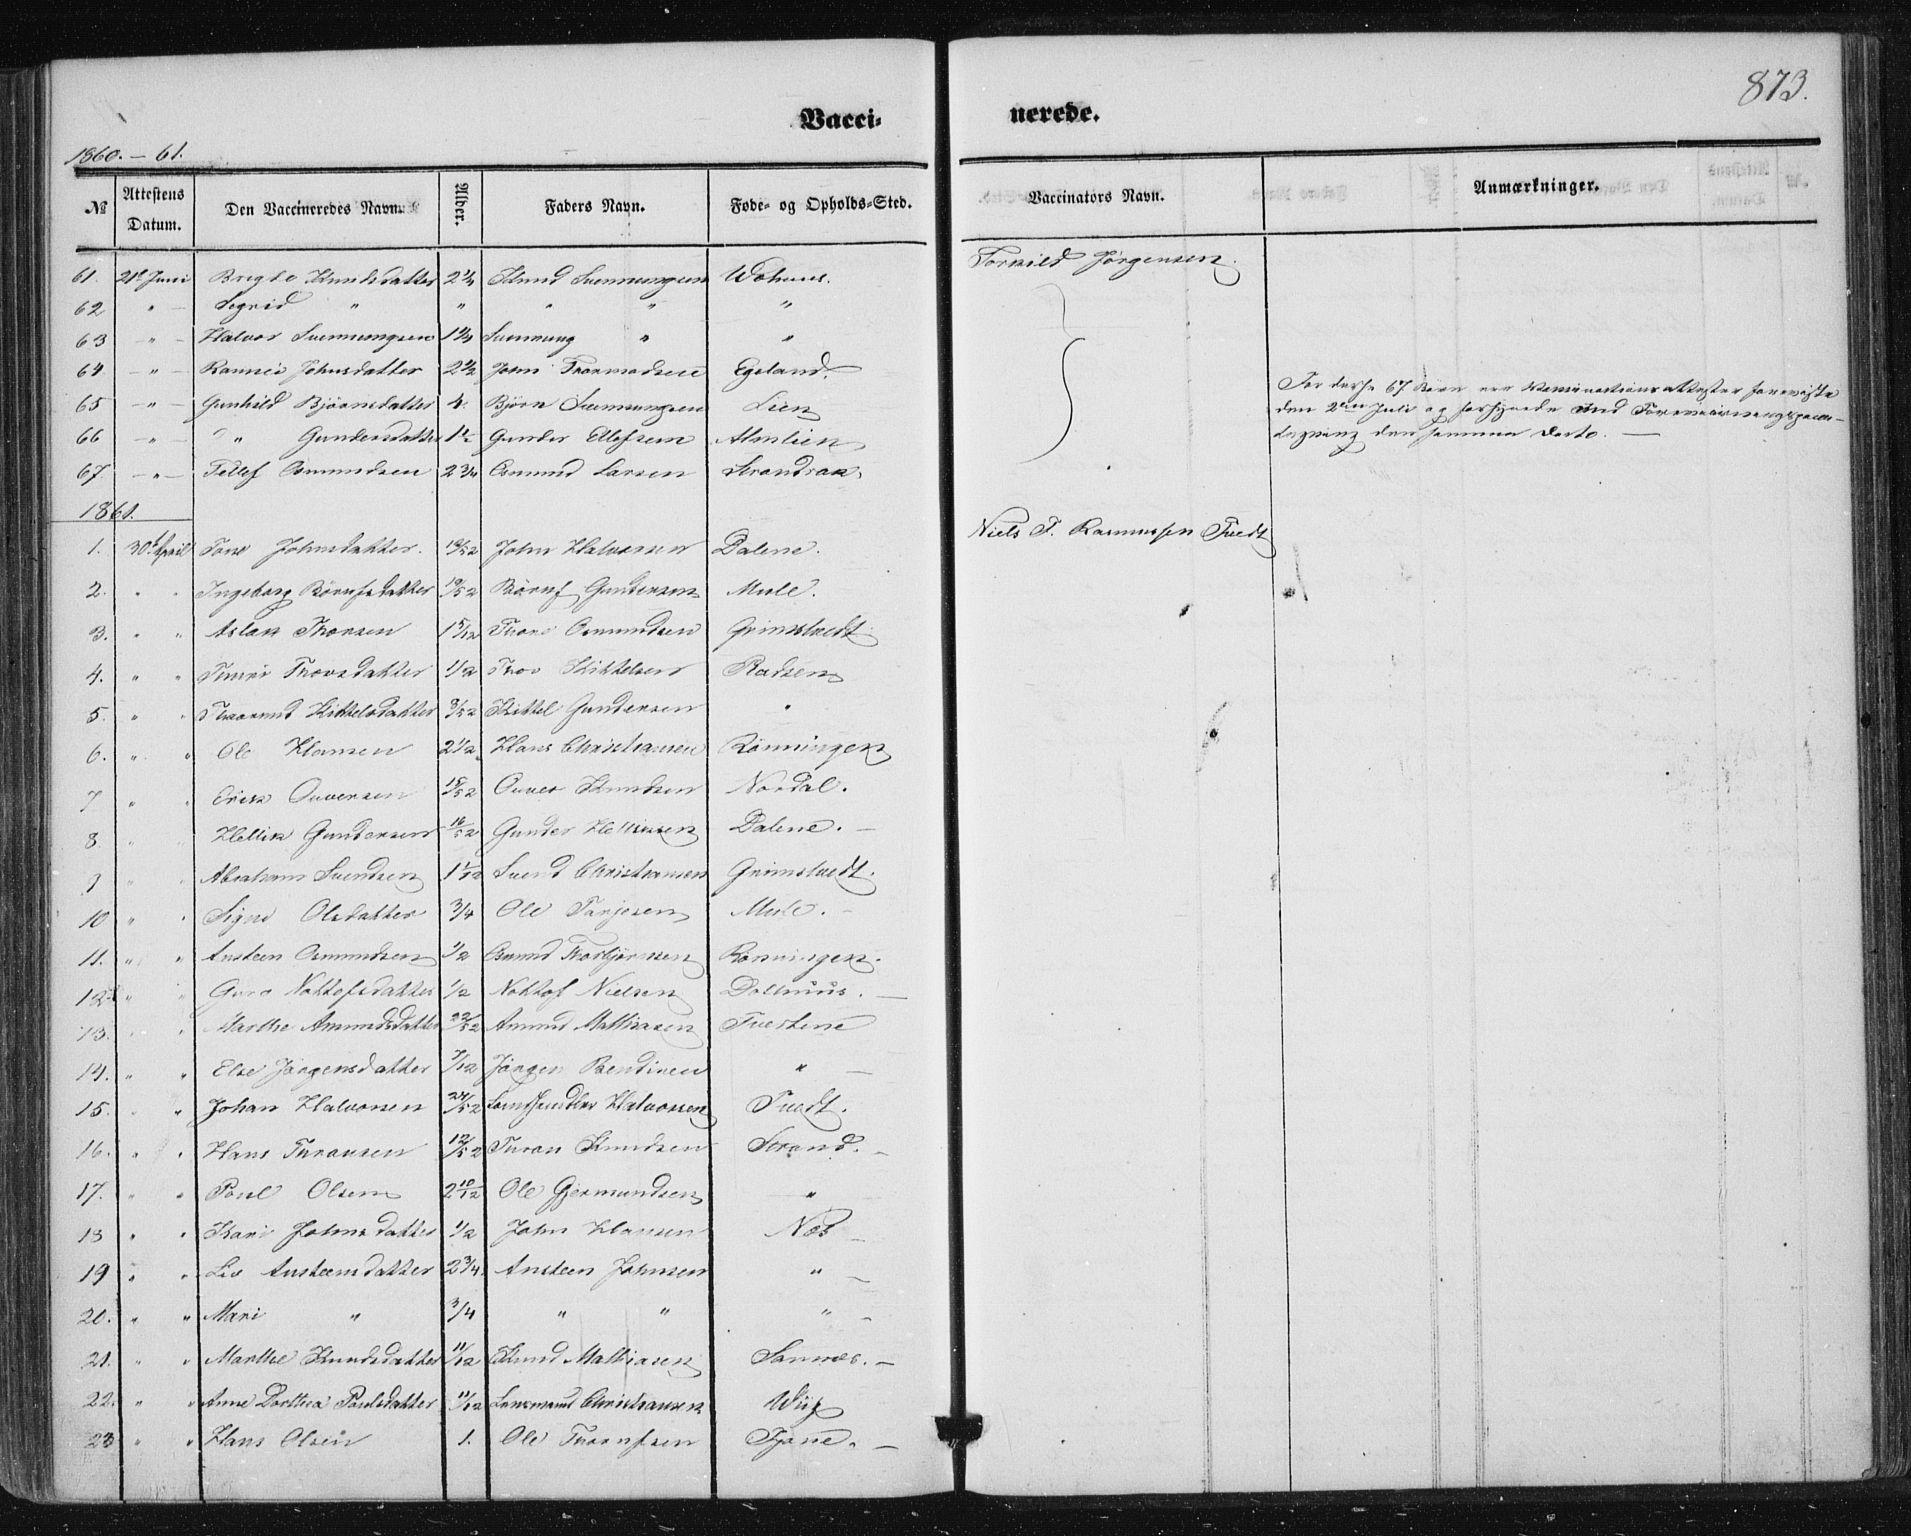 SAKO, Nissedal kirkebøker, F/Fa/L0003: Ministerialbok nr. I 3, 1846-1870, s. 872-873